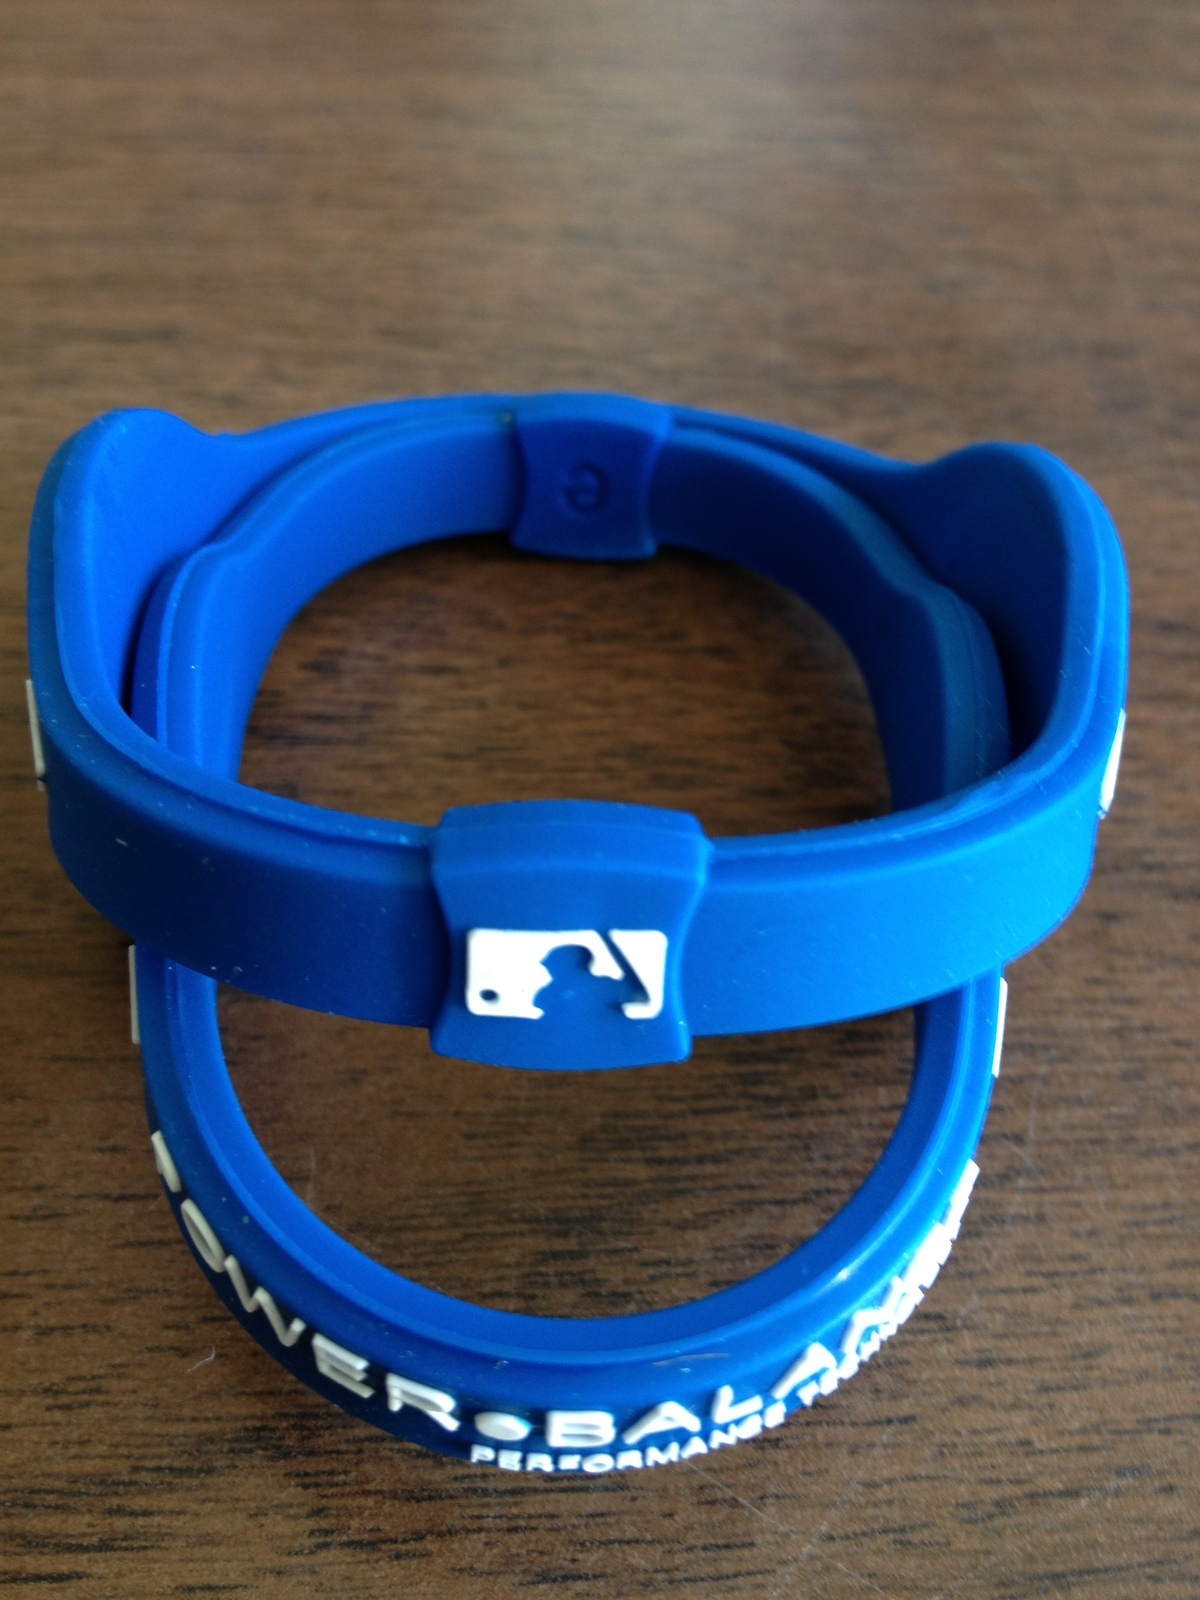 MLB Power Energy Bracelets image 11